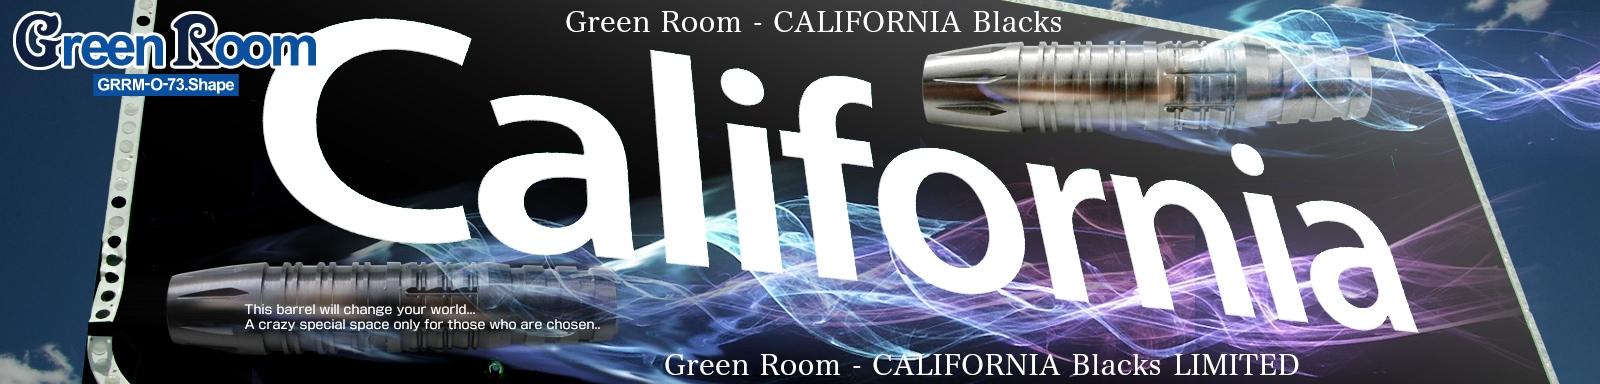 Green Room California Blacks 東田臣選手モデル